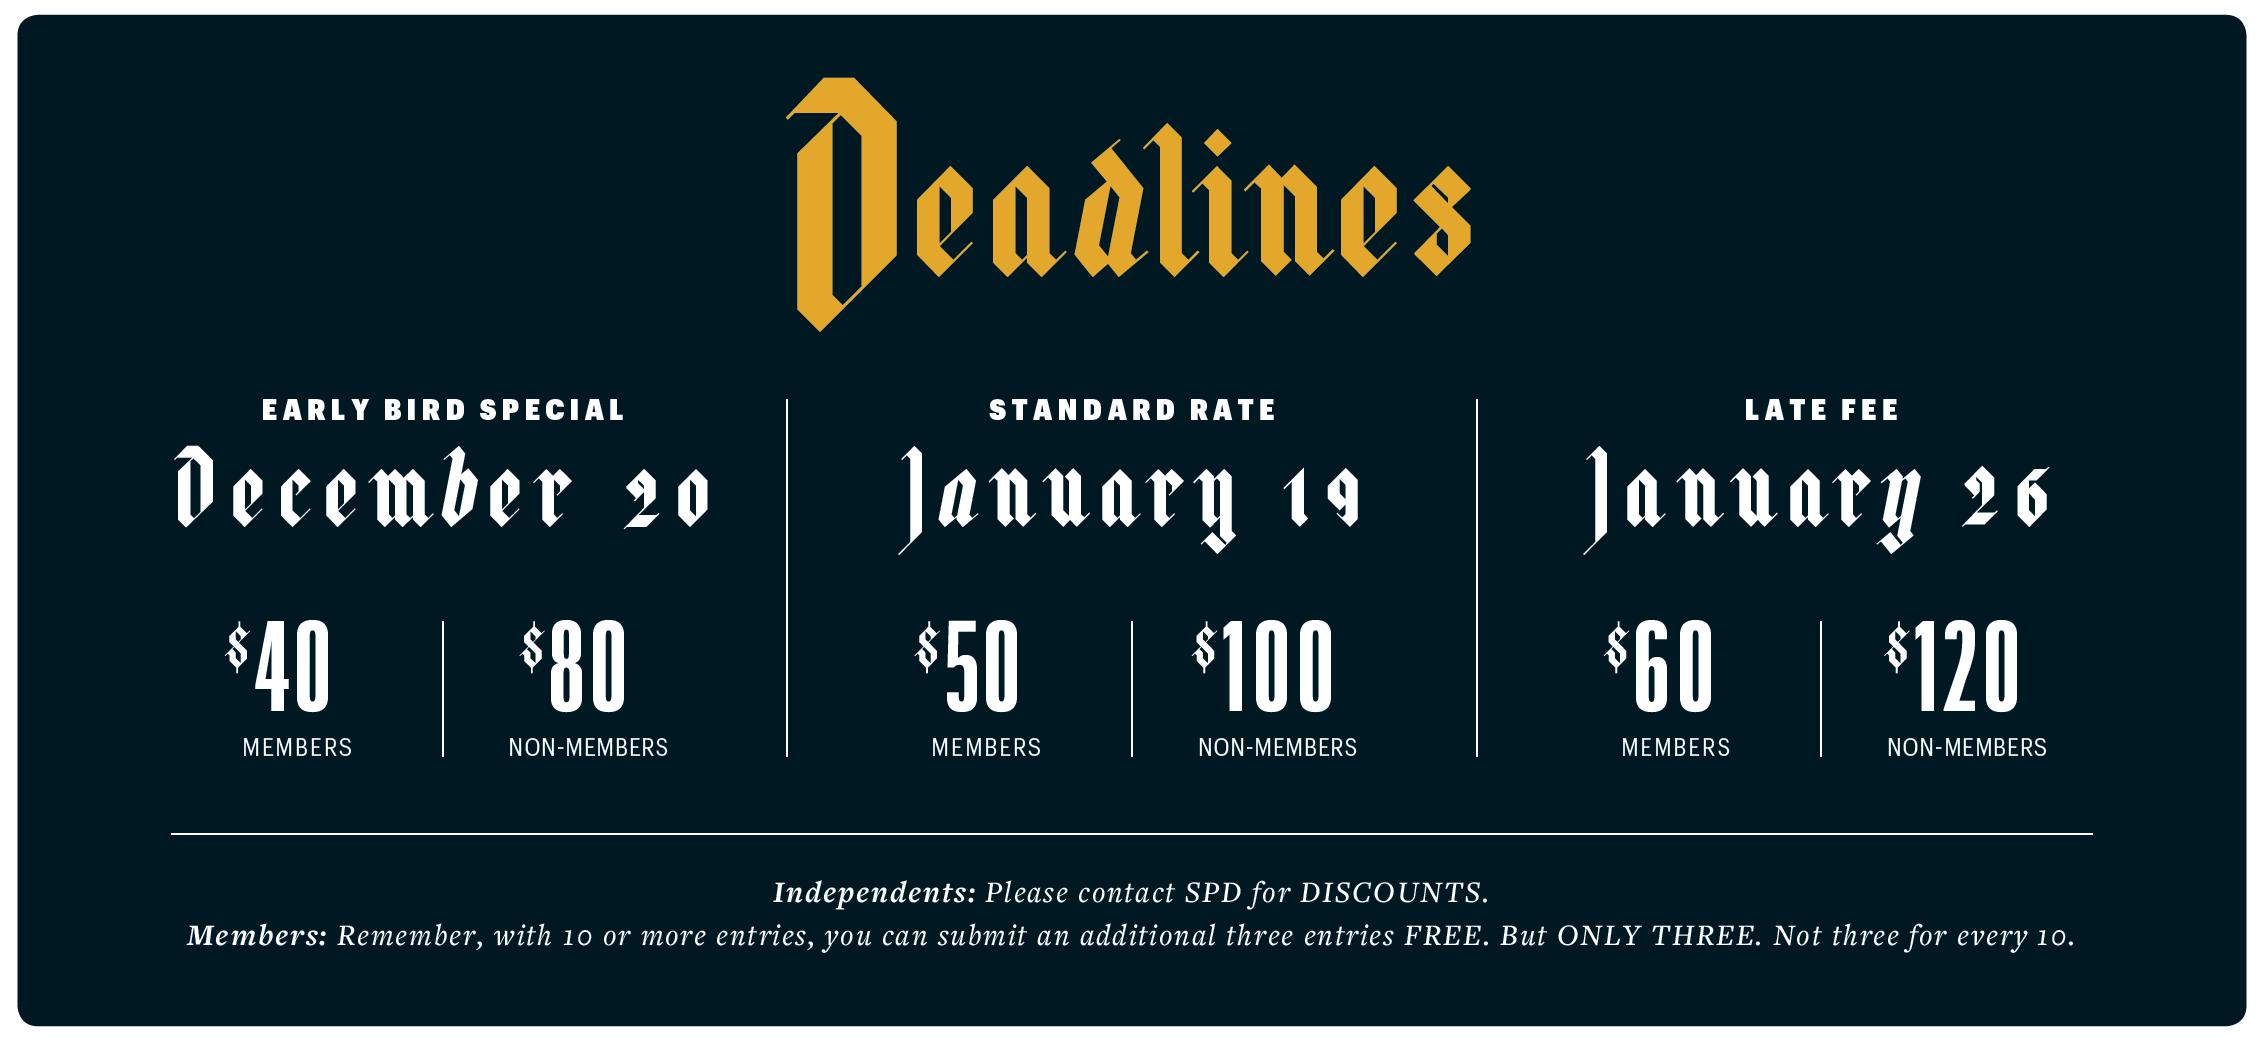 pub53_deadlines.png